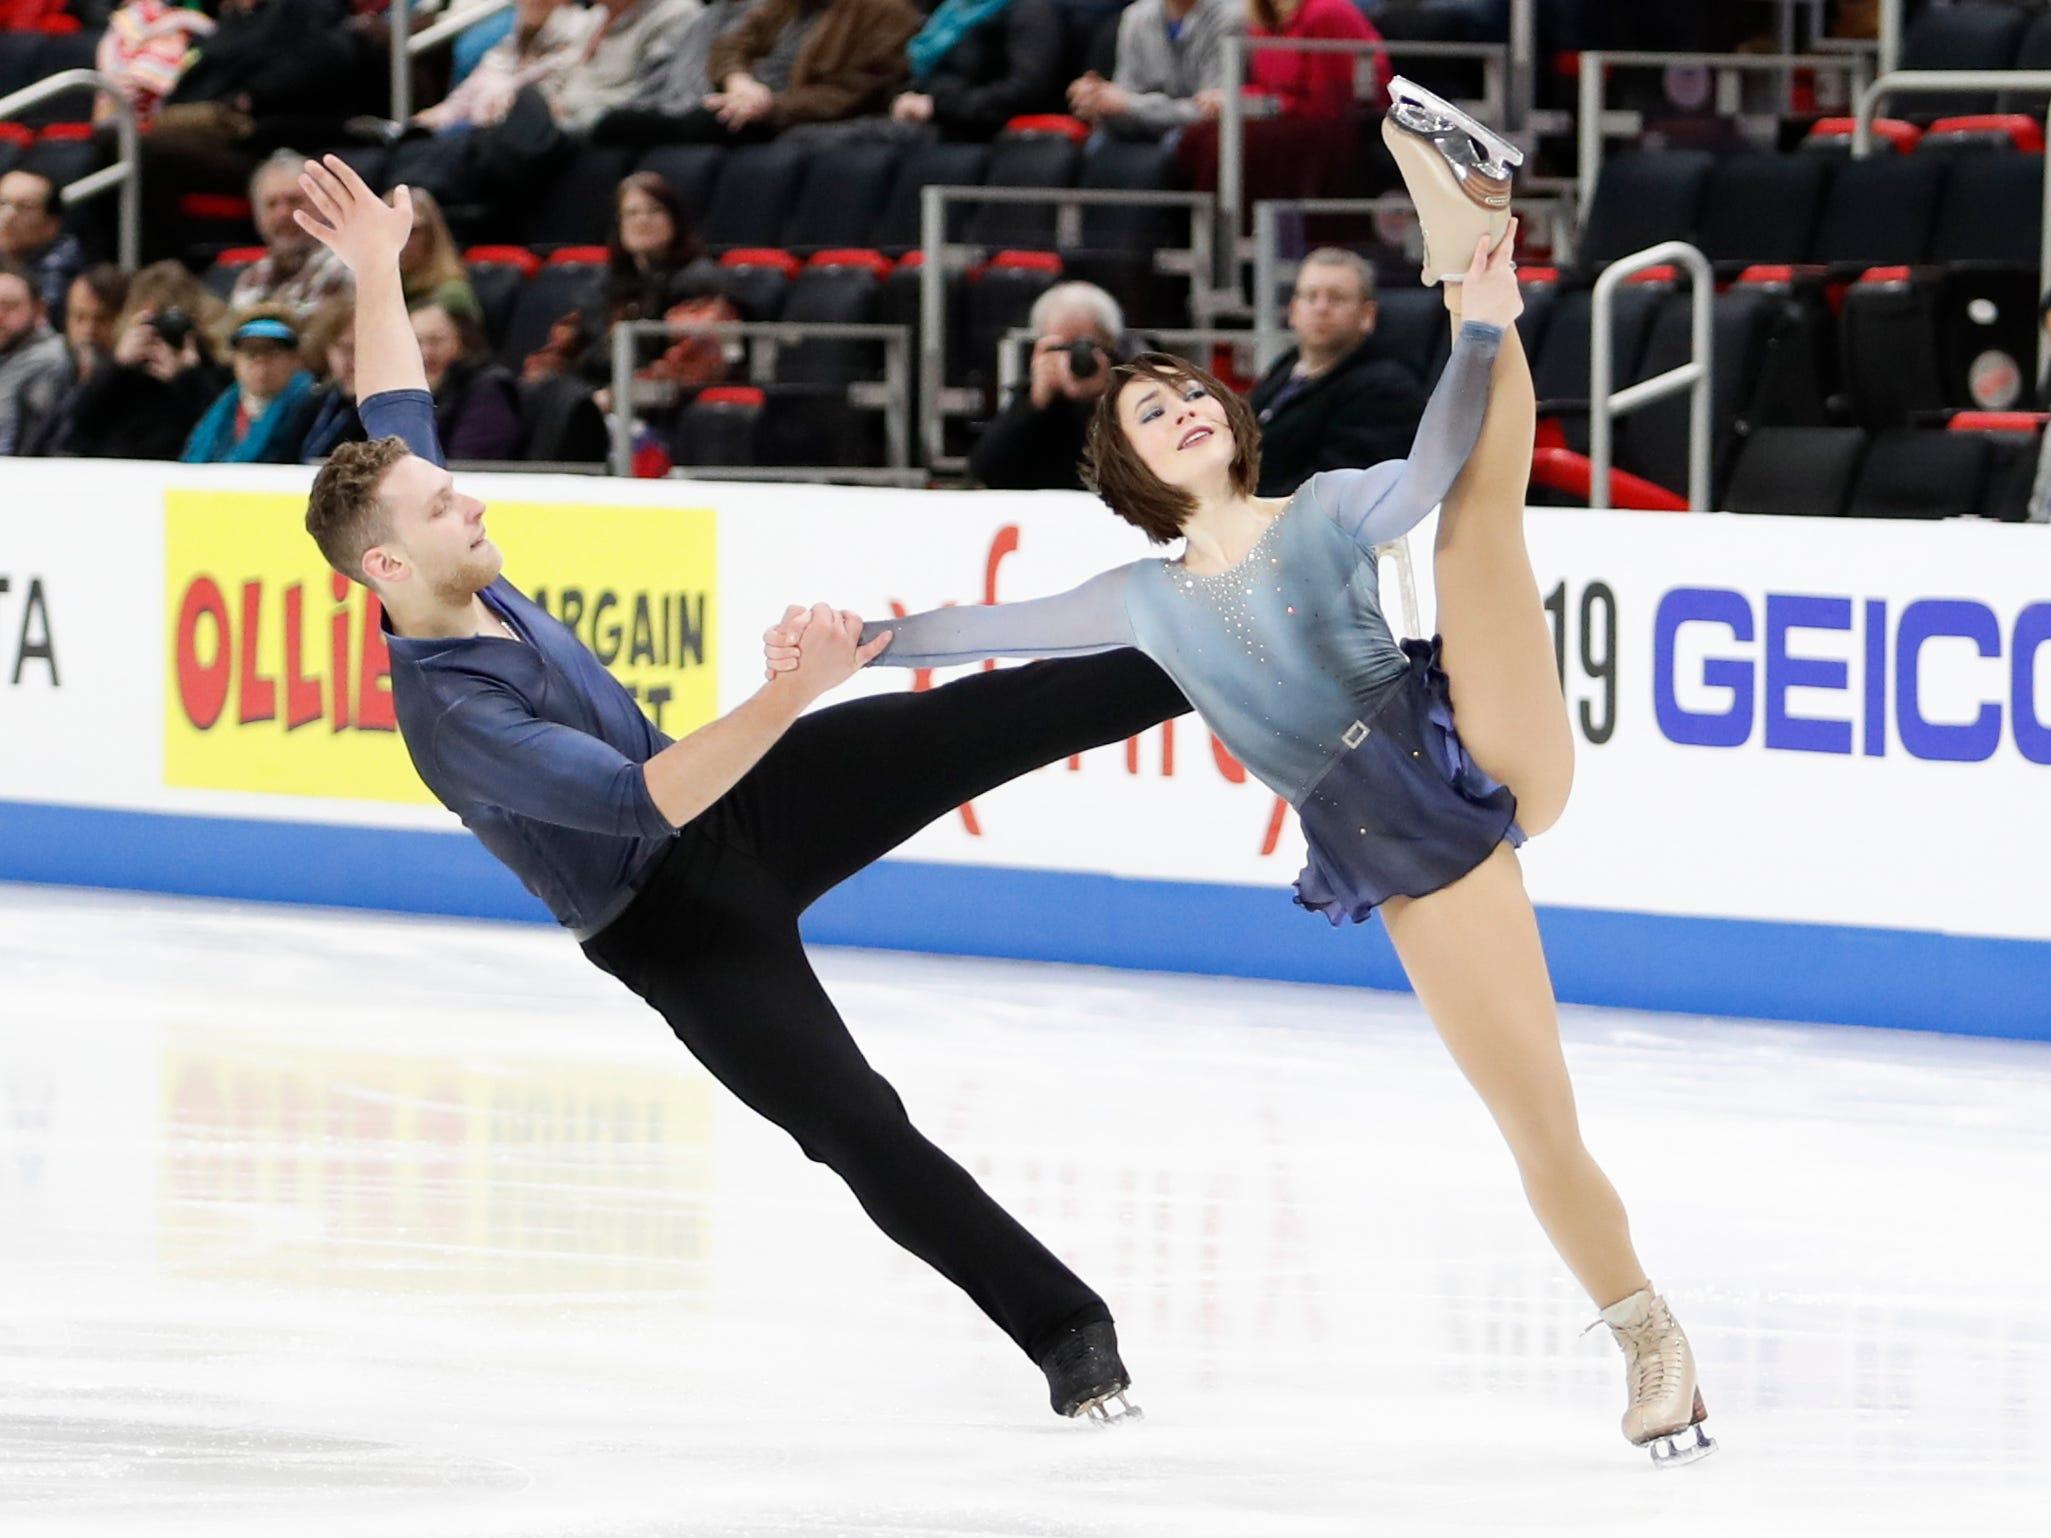 Allison Timlen and Justin Highgate-Brutman perform in the pairs short program.